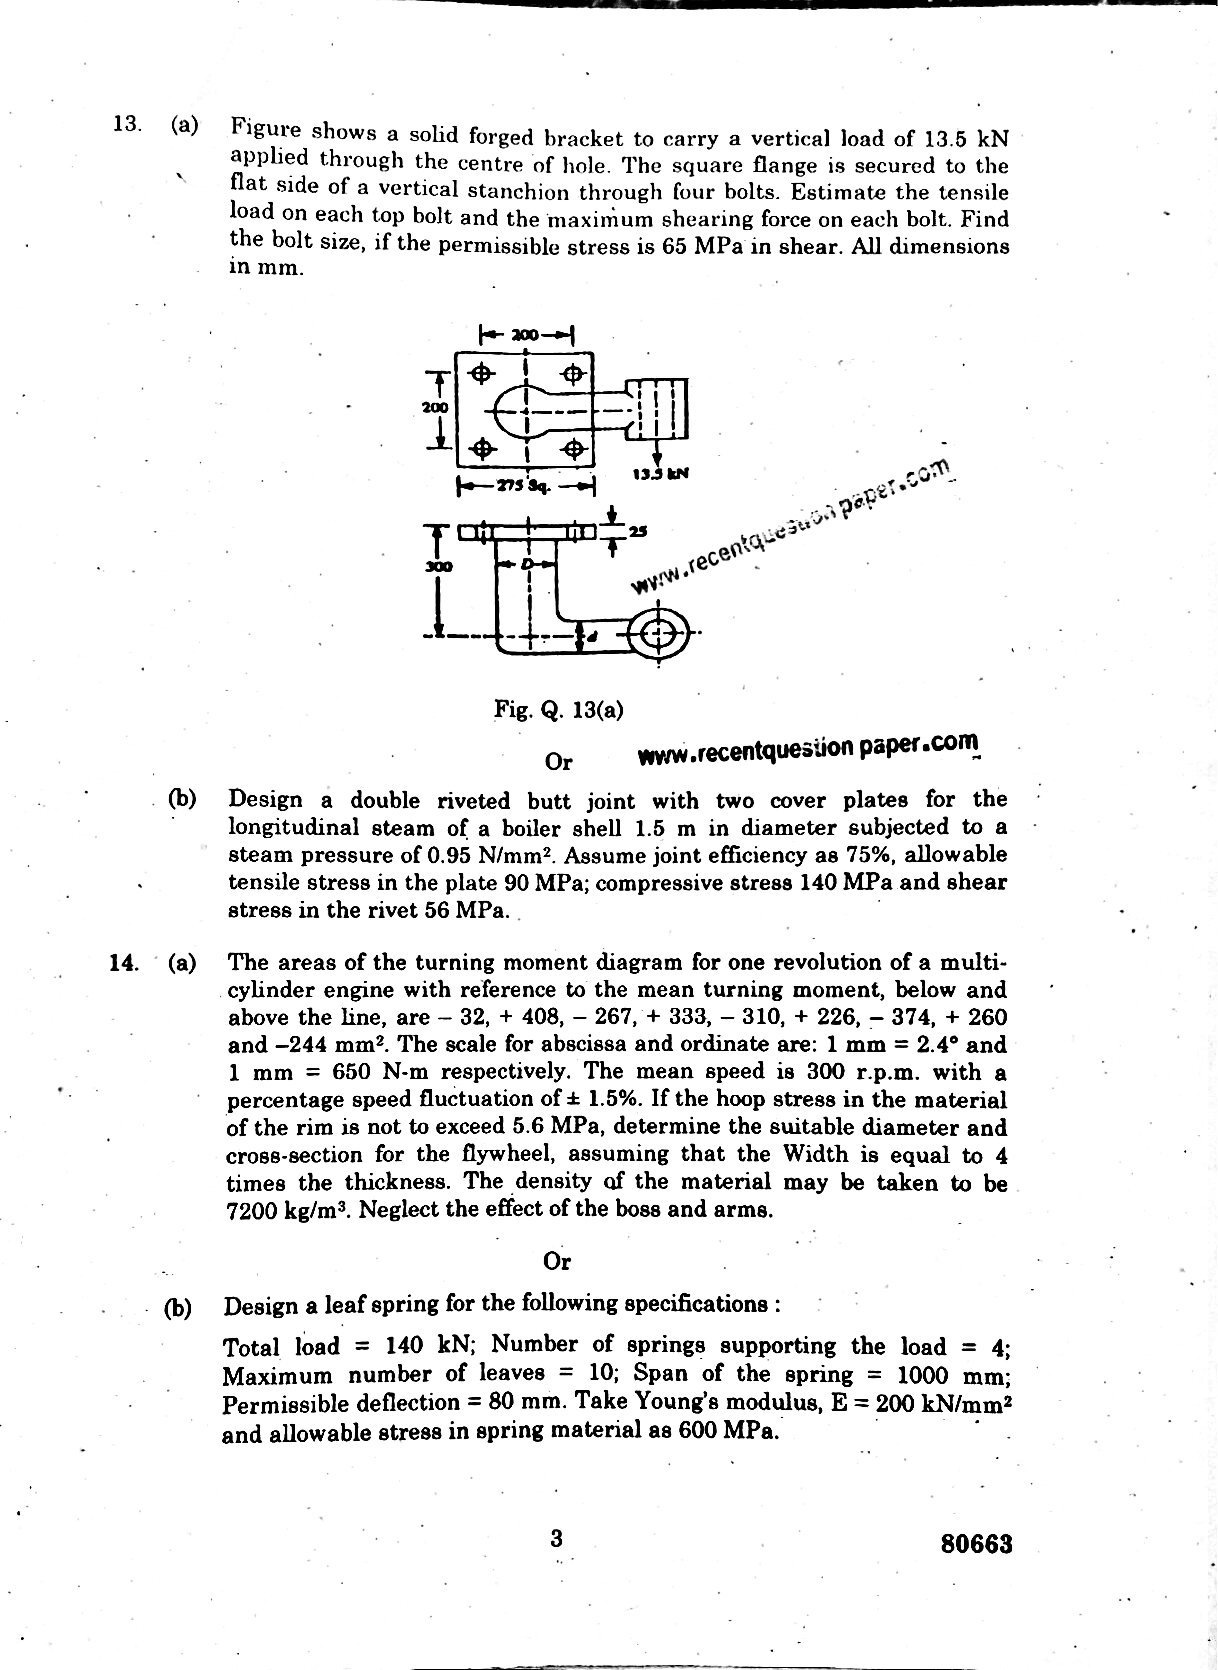 Design Of Machine Elements Anna University Question Paper Nov/Dec 2016